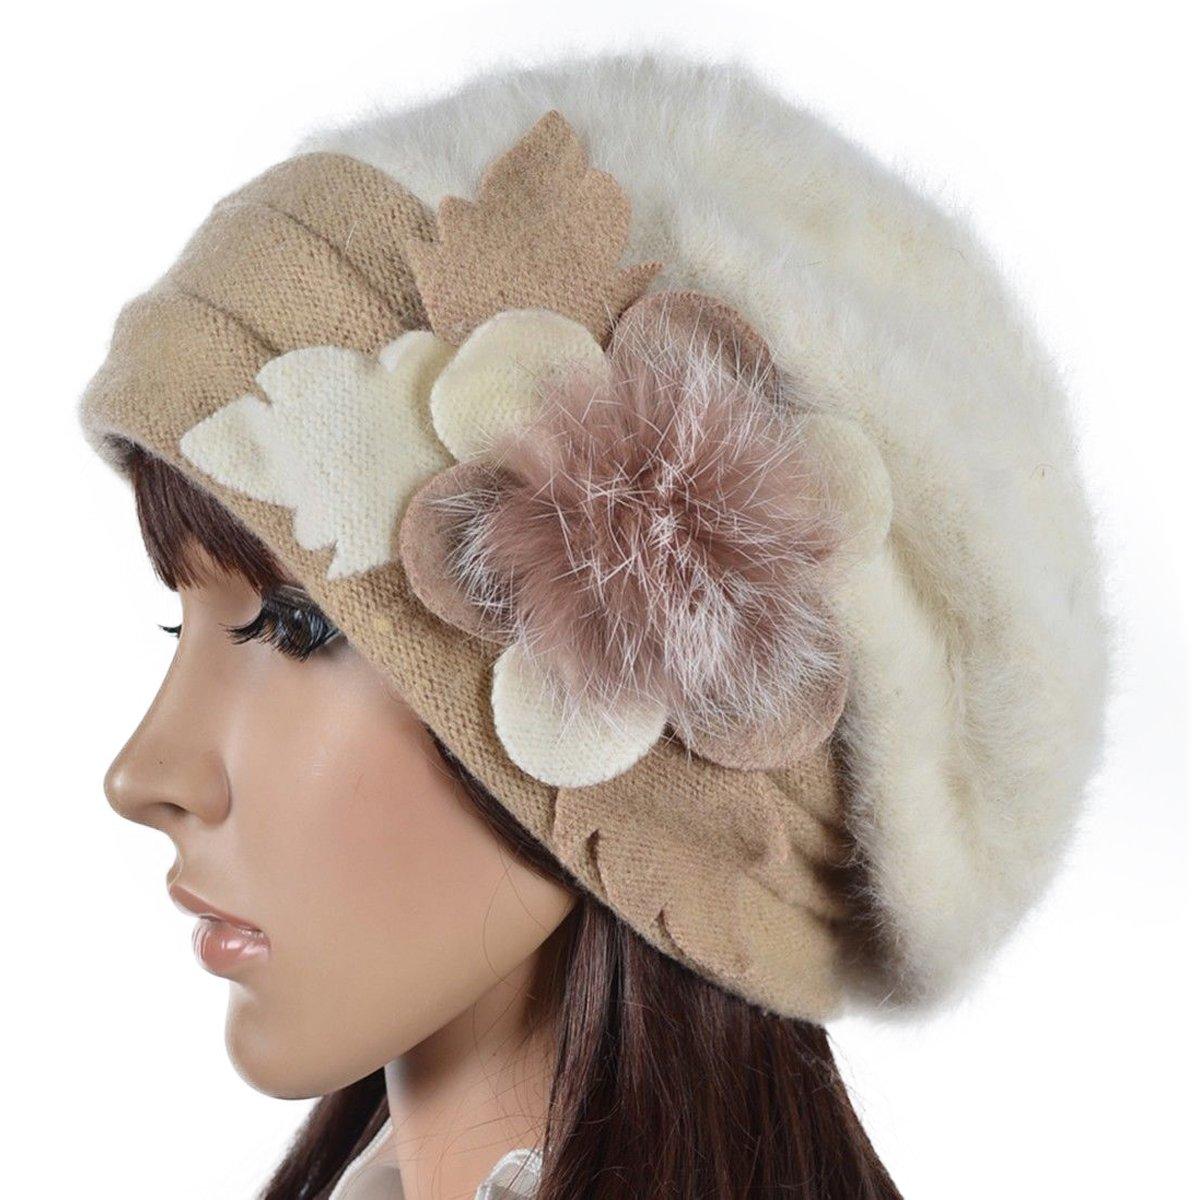 Women's French Beret - 100% Wool Cloche Hat - Beret Beanie for Winter C020 (Br022-Cream)